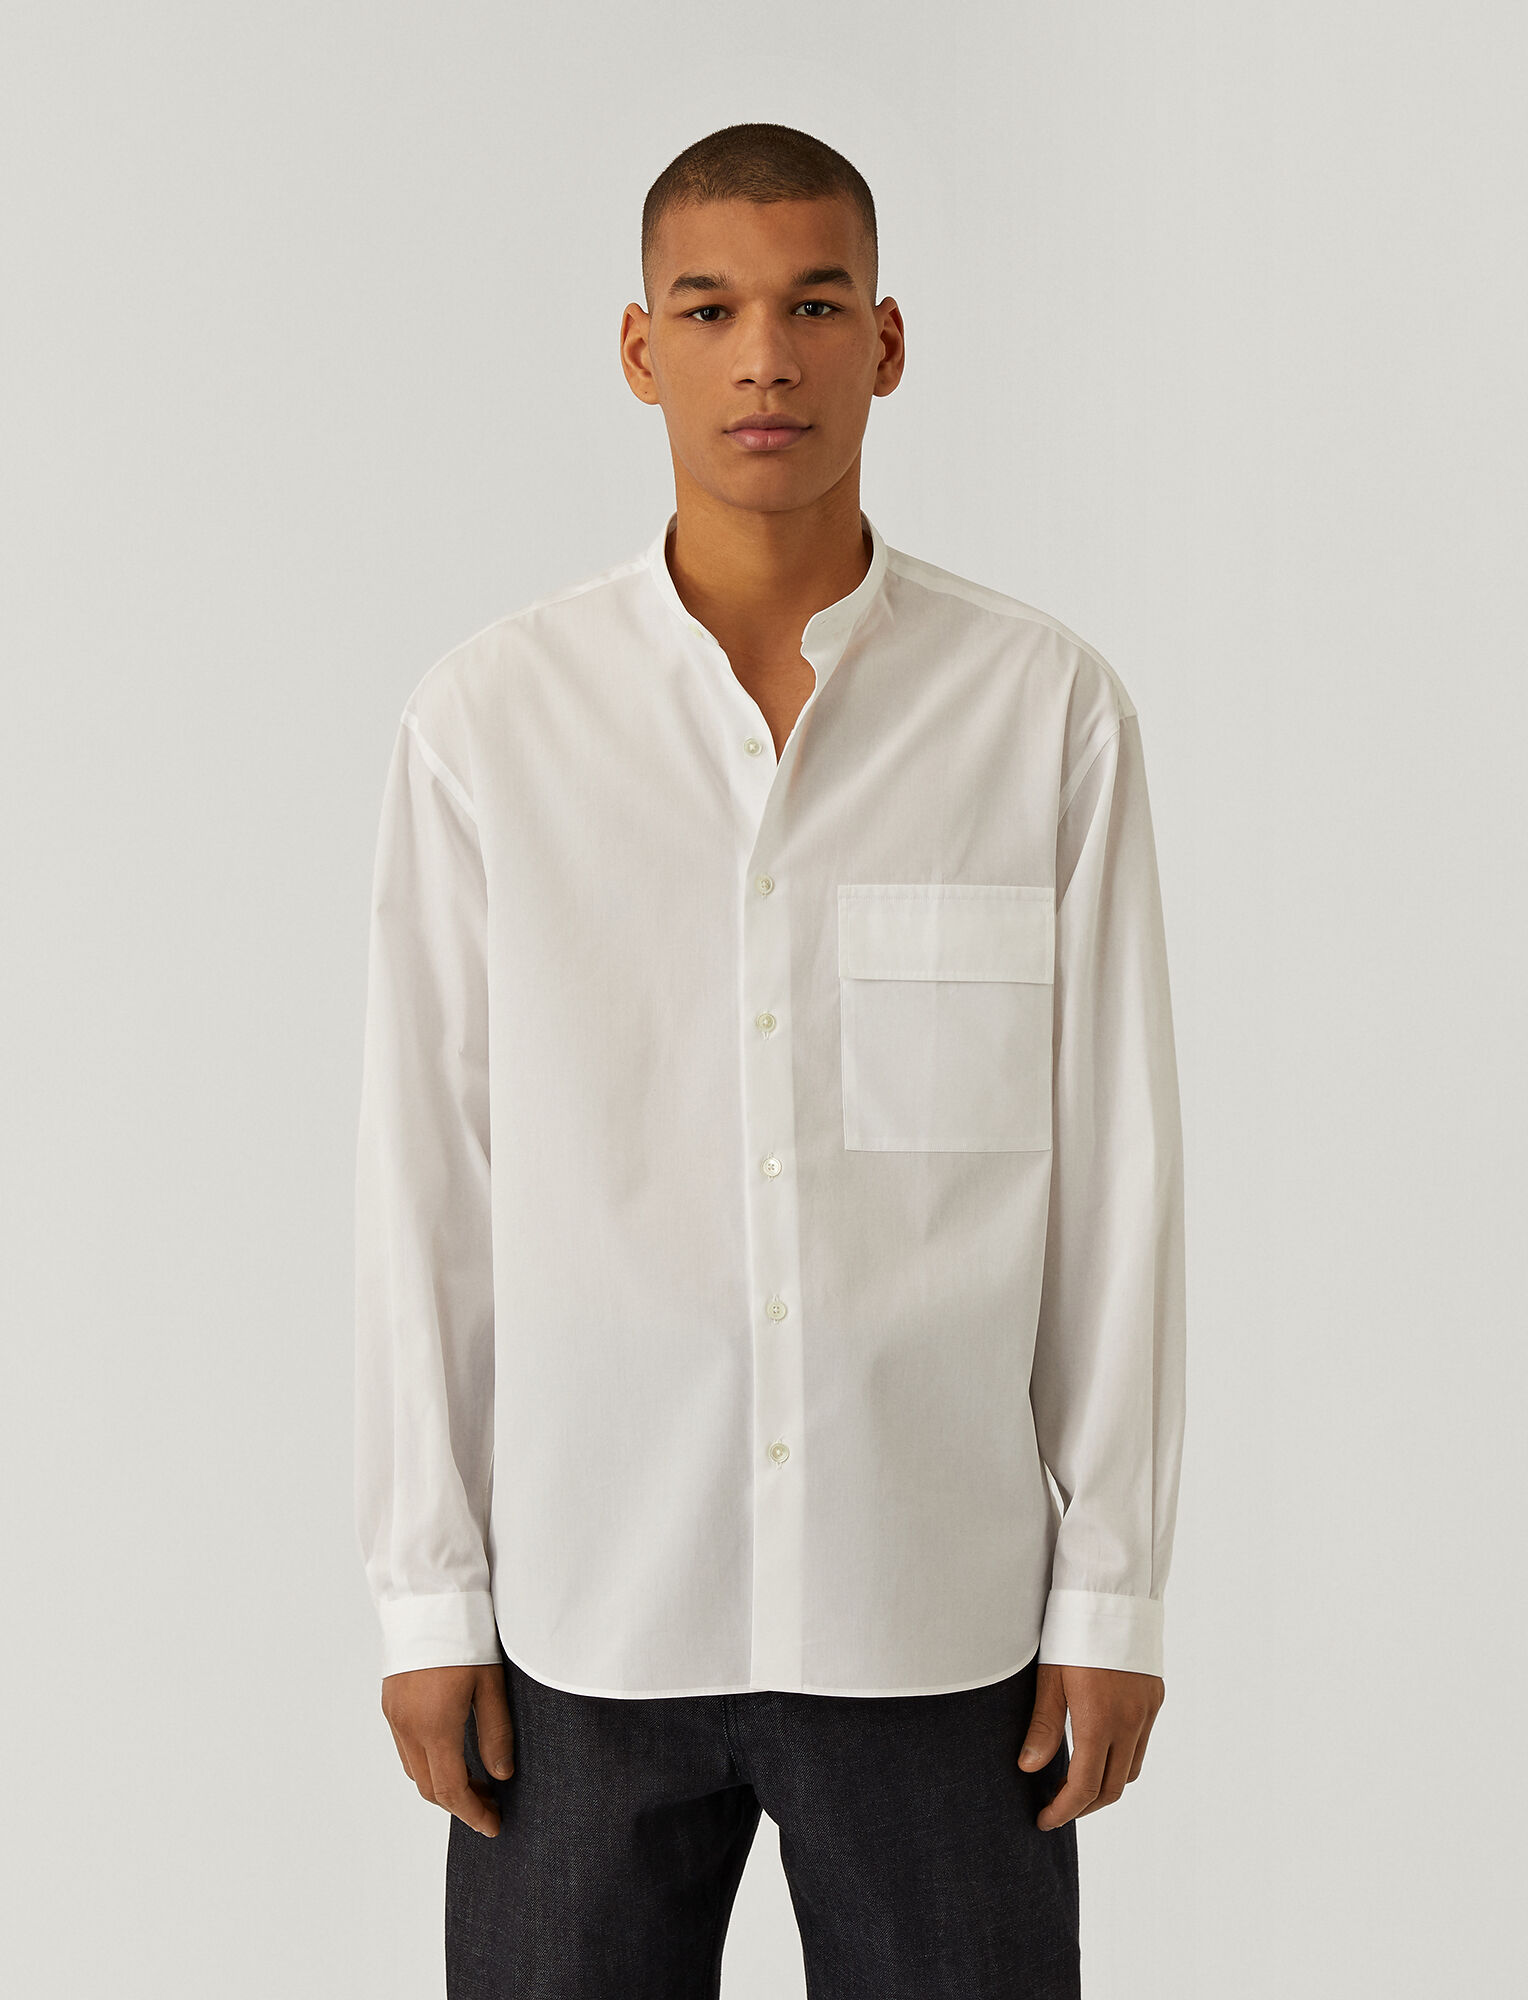 Joseph, Mercerised Poplin Cold Shirt, in WHITE